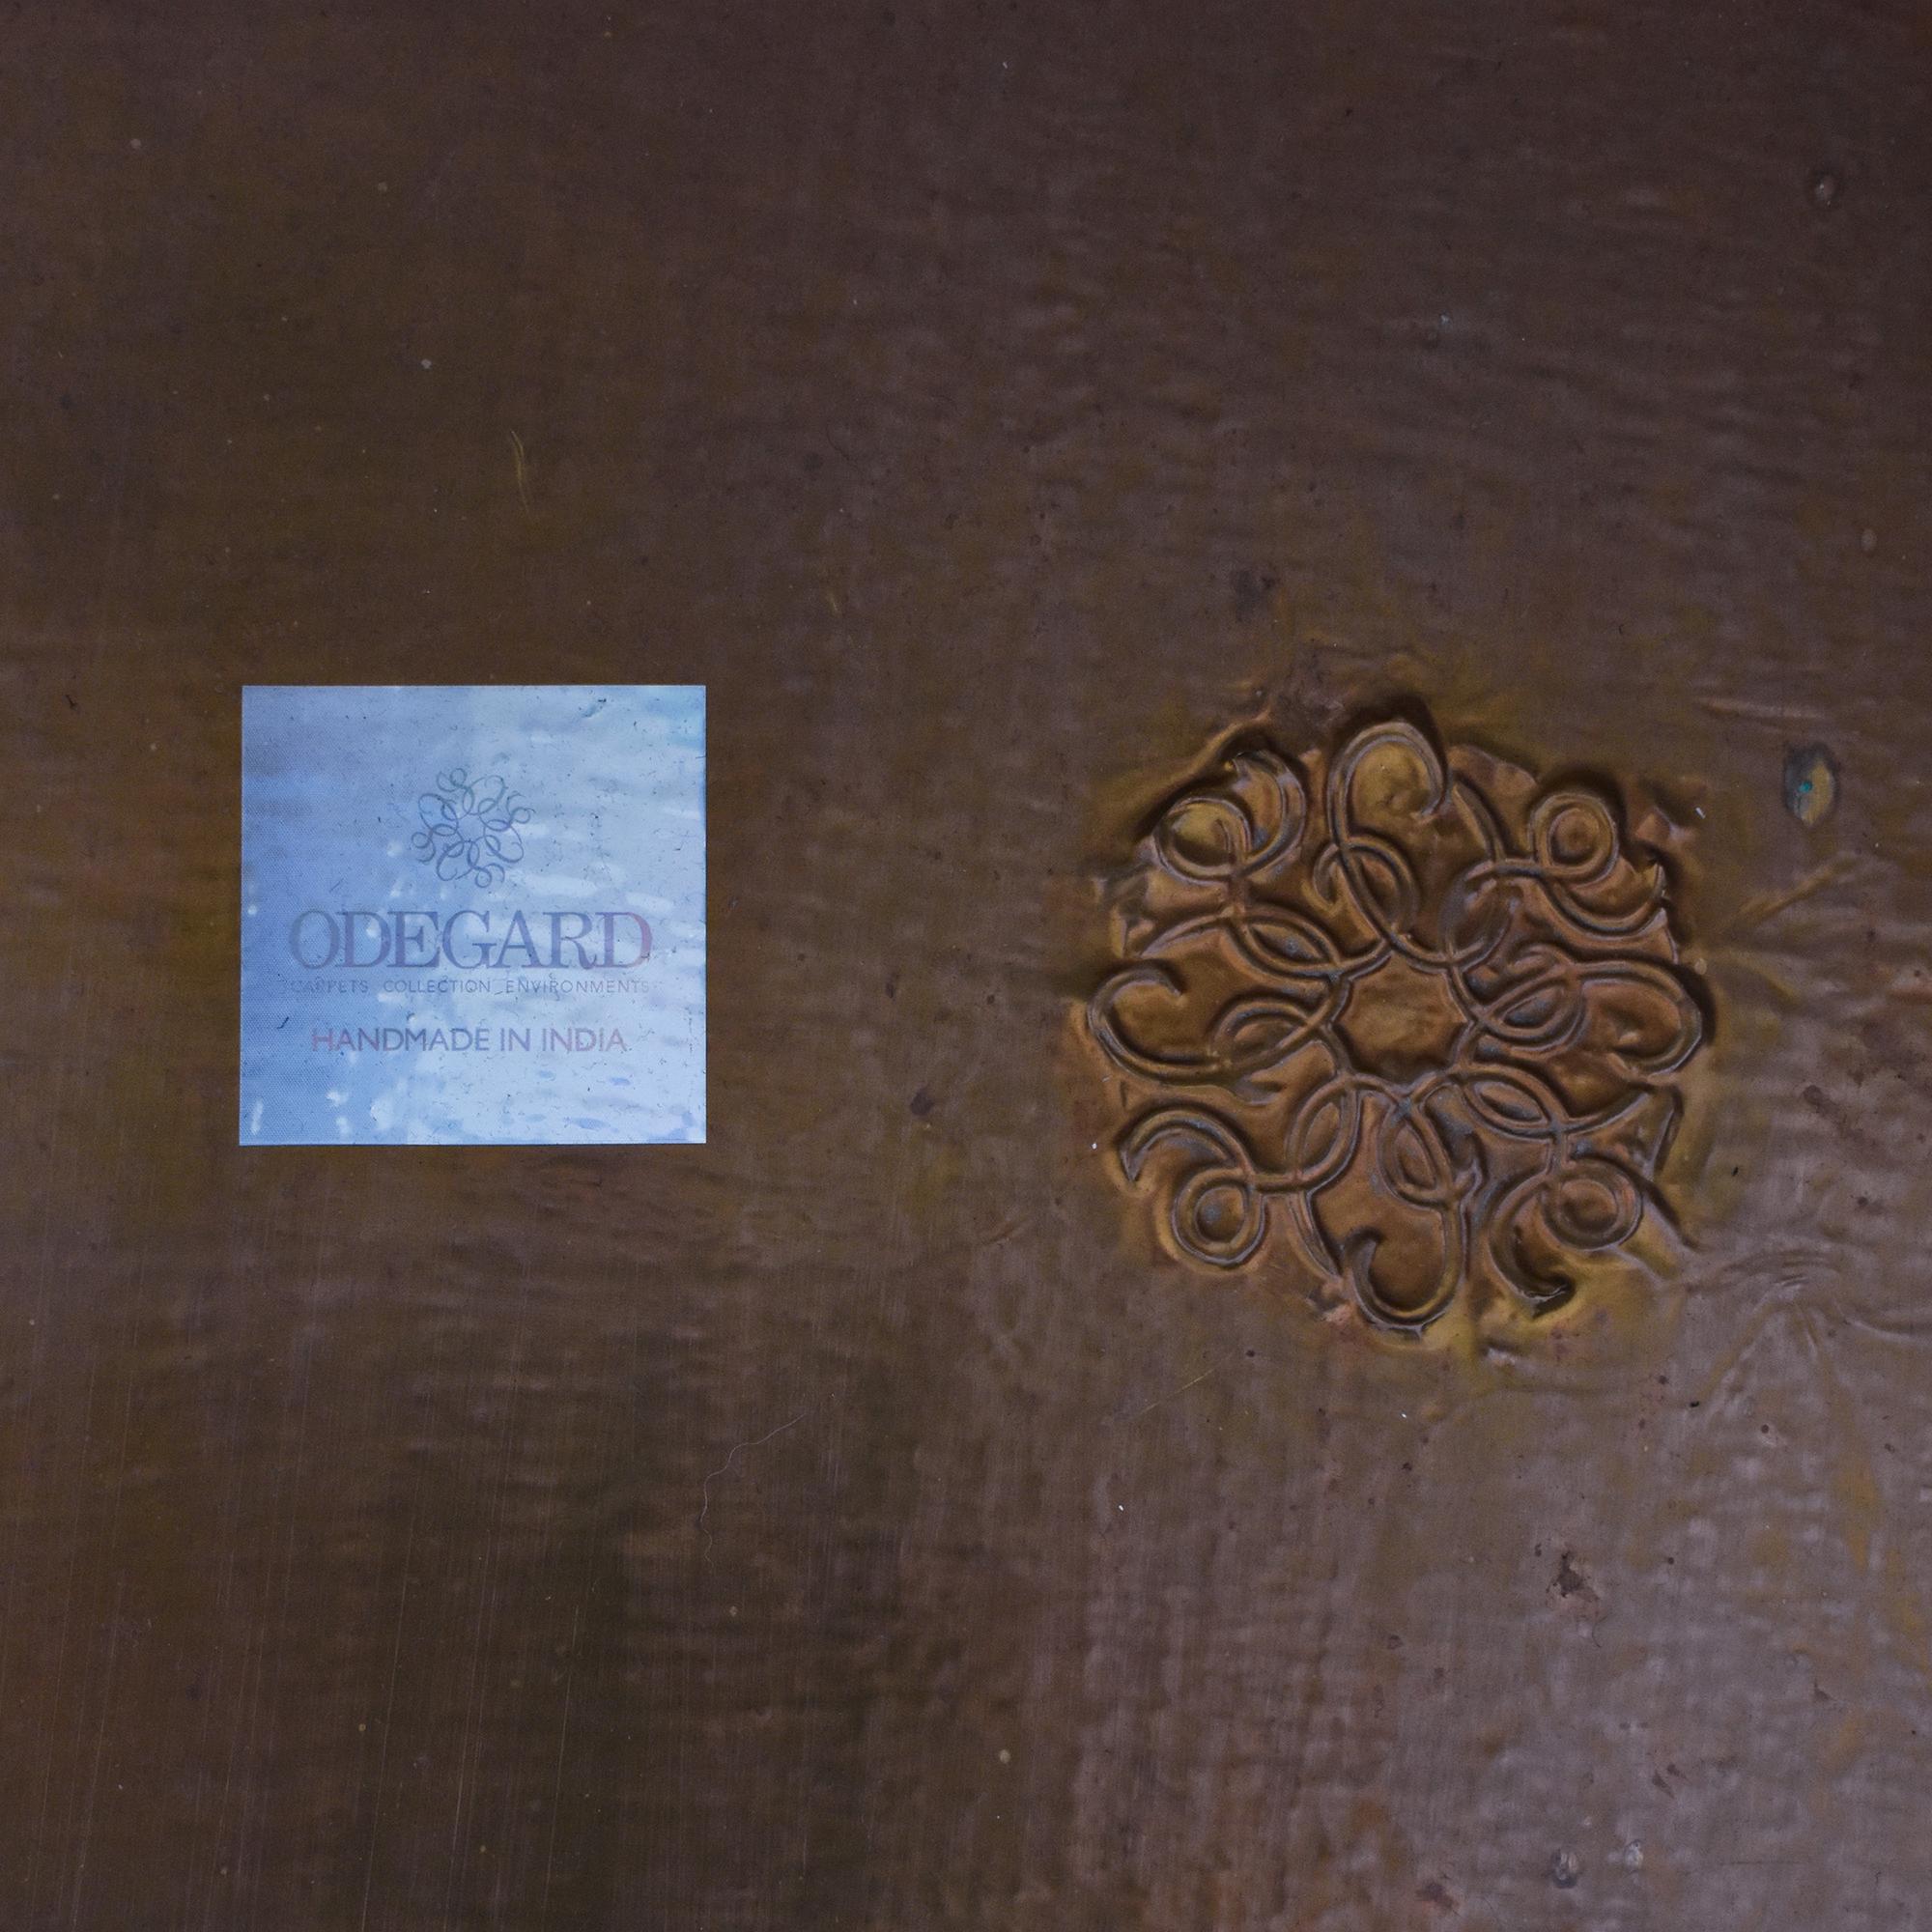 Odegard Odegard Louise Dining Table used